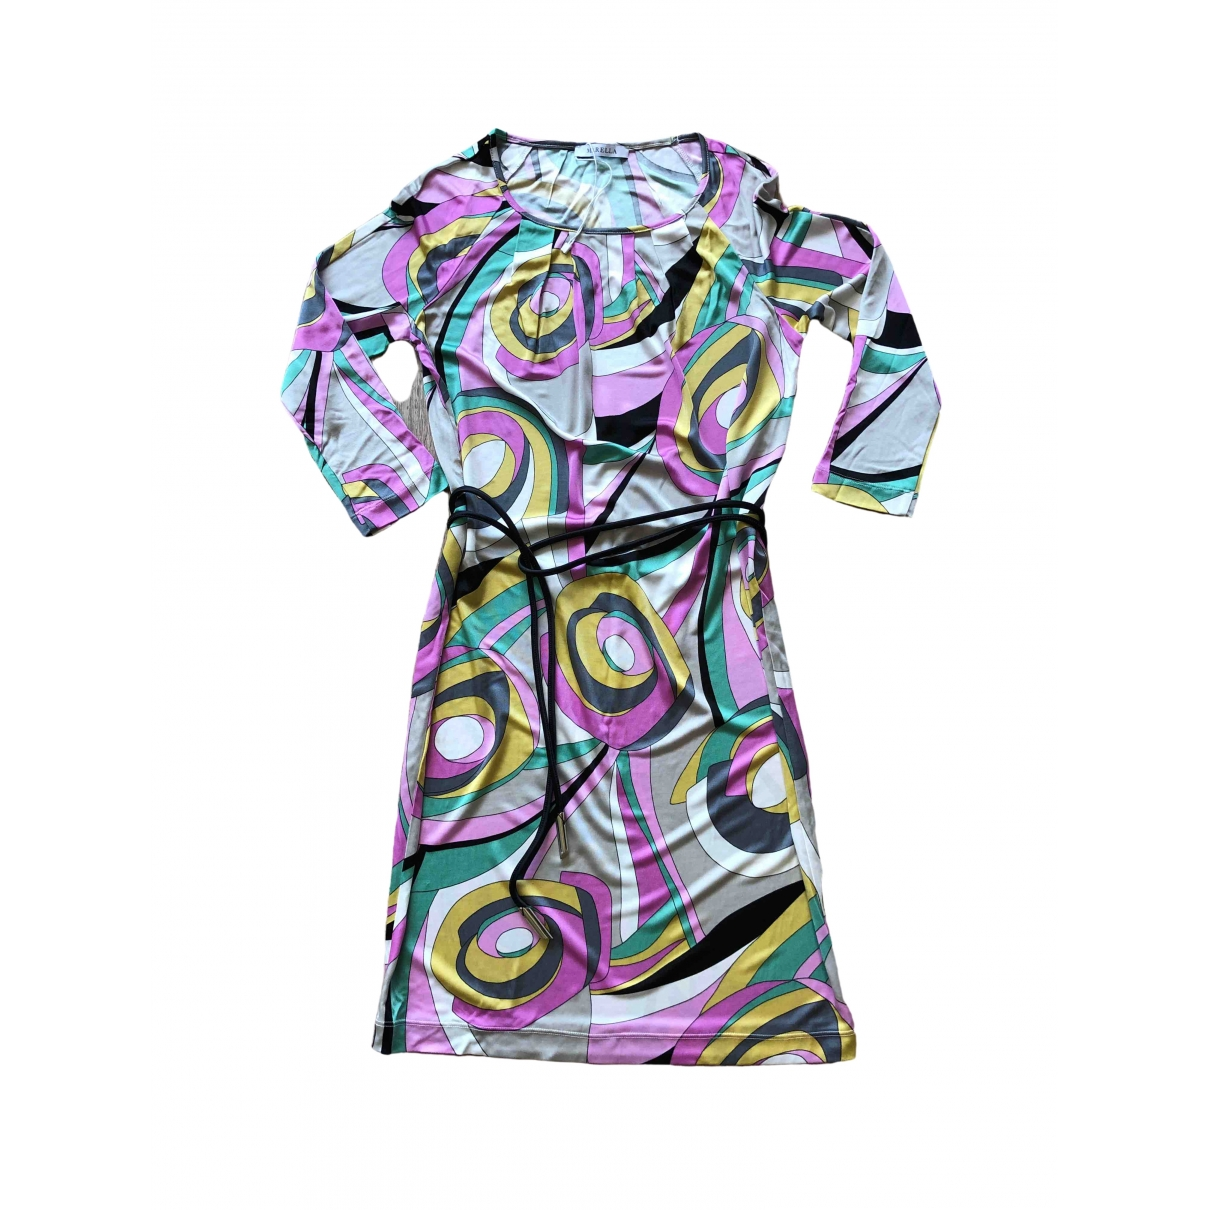 Marella \N Multicolour dress for Women S International